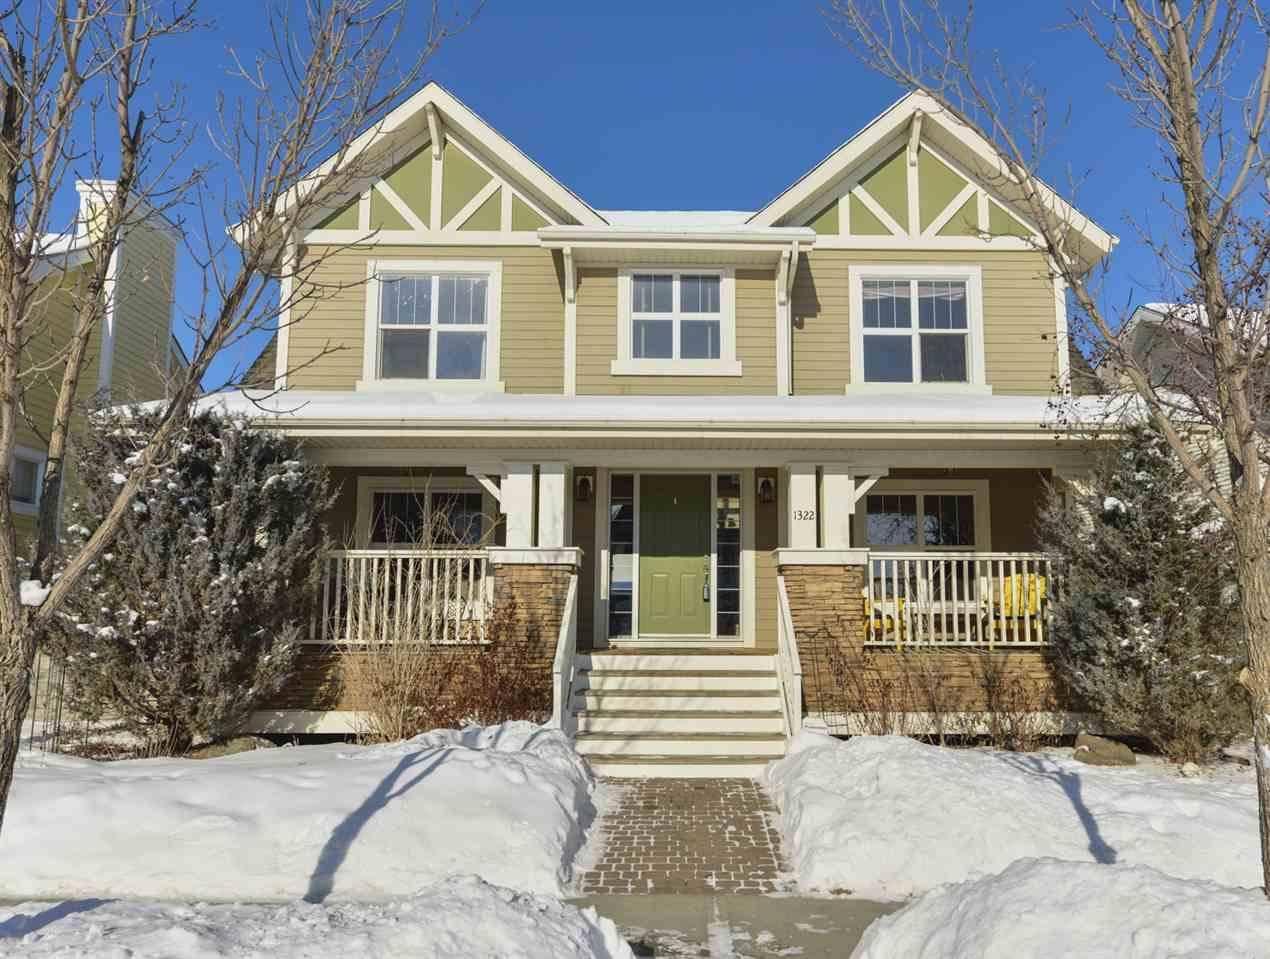 House for sale at 1322 Kapyong Ave Nw Edmonton Alberta - MLS: E4188064